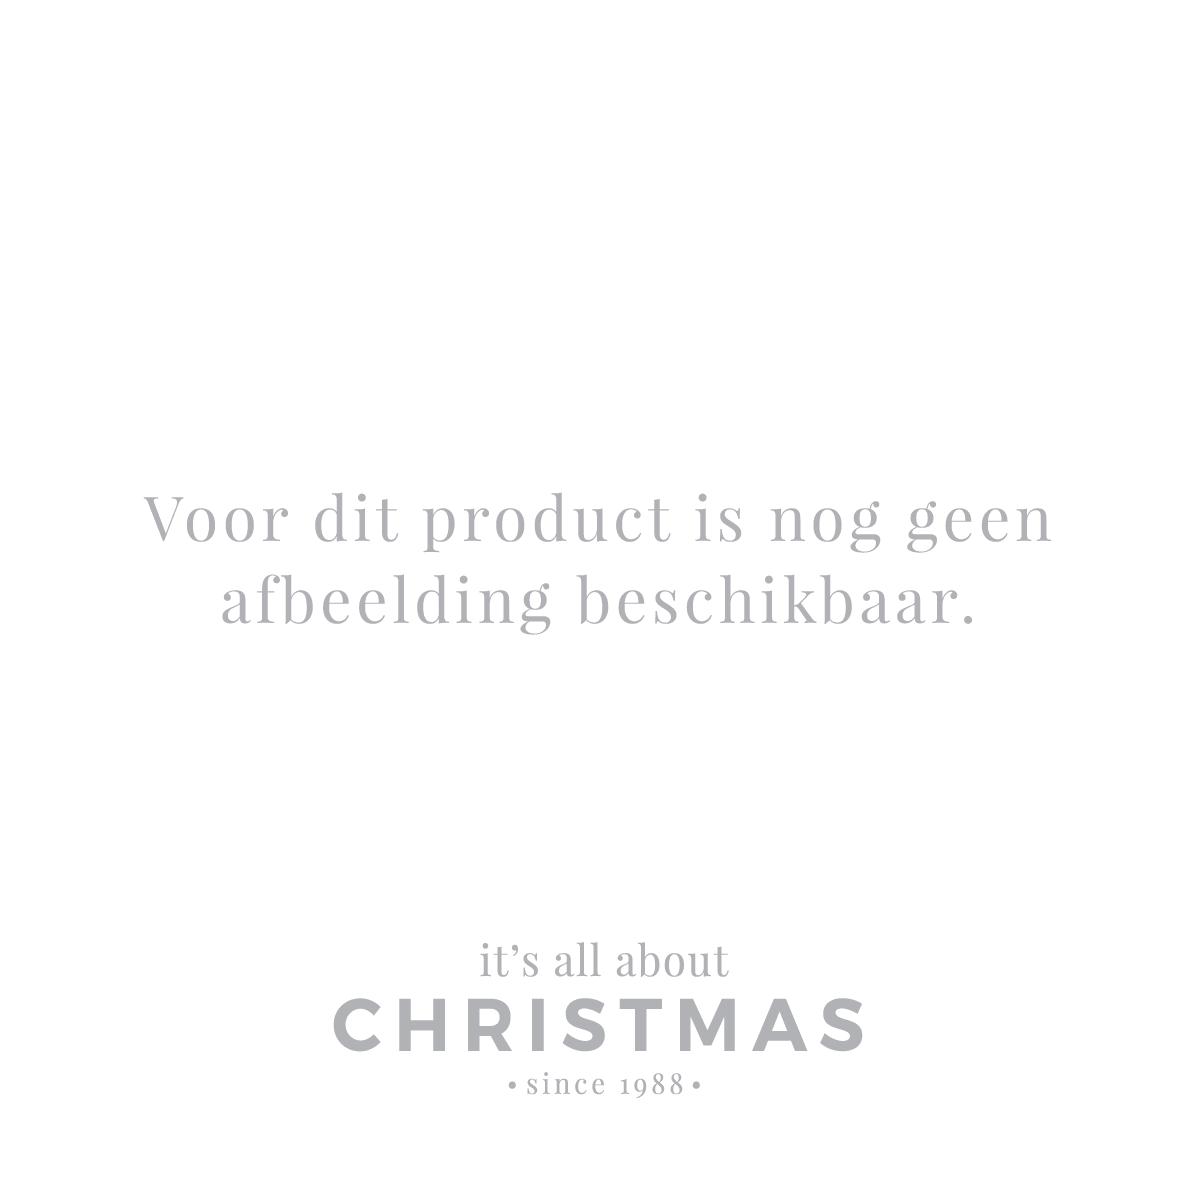 Edle Weihnachtskugel Schneeflocke, zartgrün, Glas, 8 cm